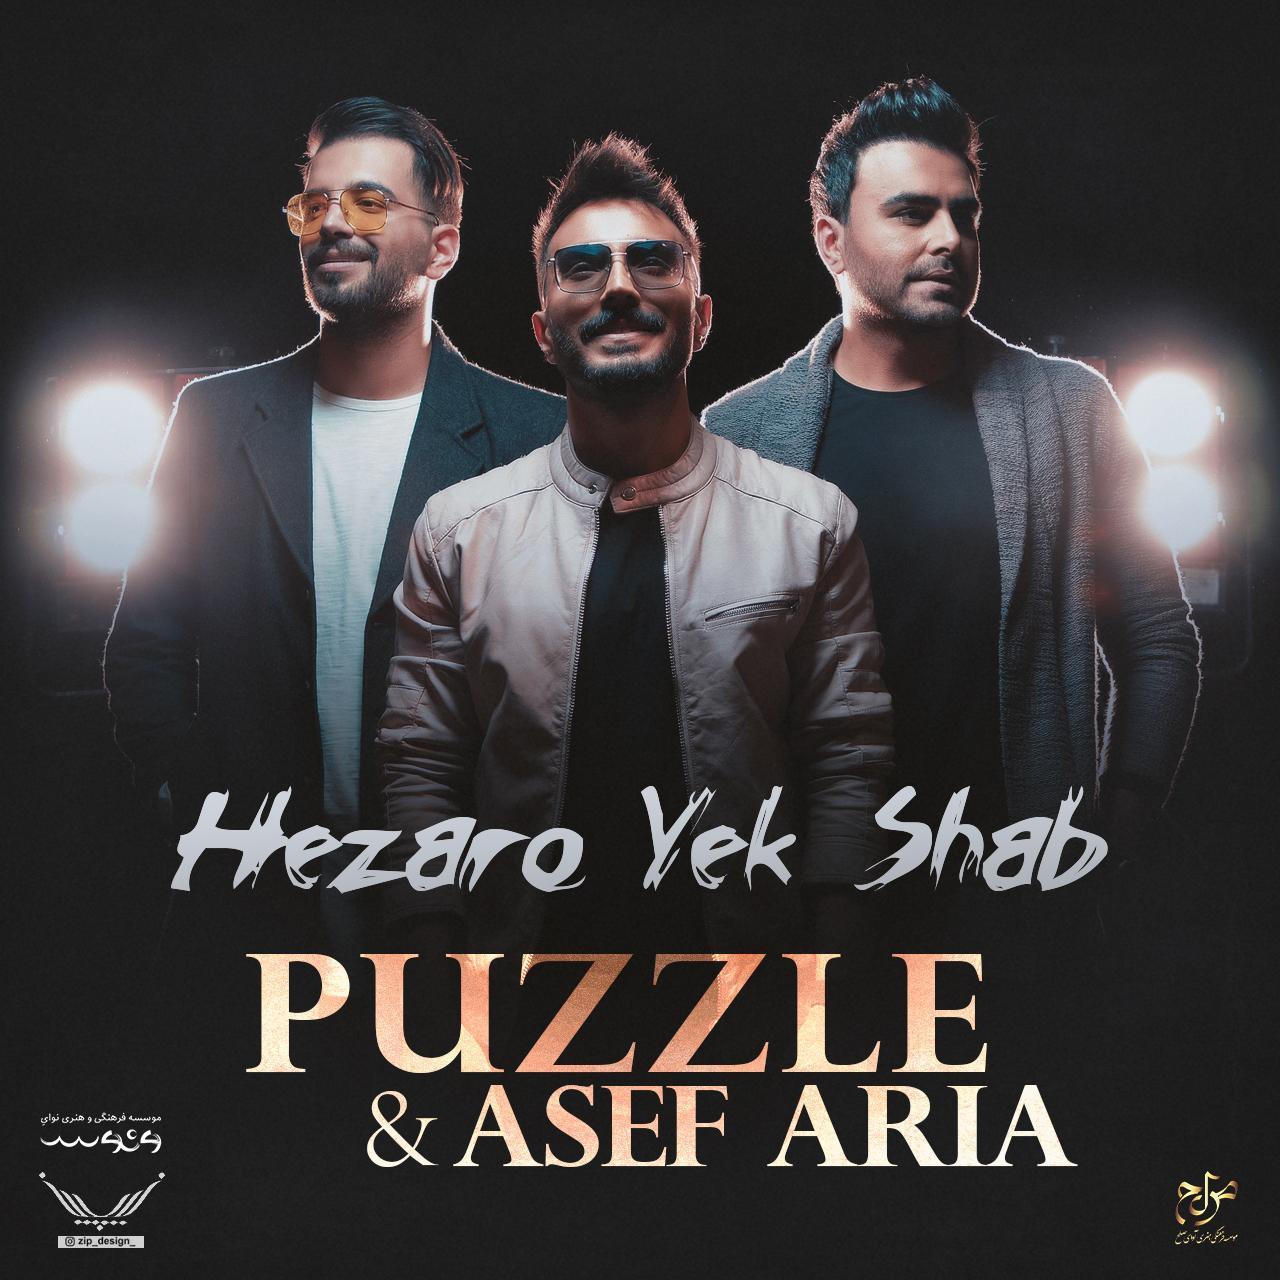 Puzzle Band - Hezaro Yek Shab - دانلود آهنگ پازل بند و آصف آریا به نام هزار و یک شب